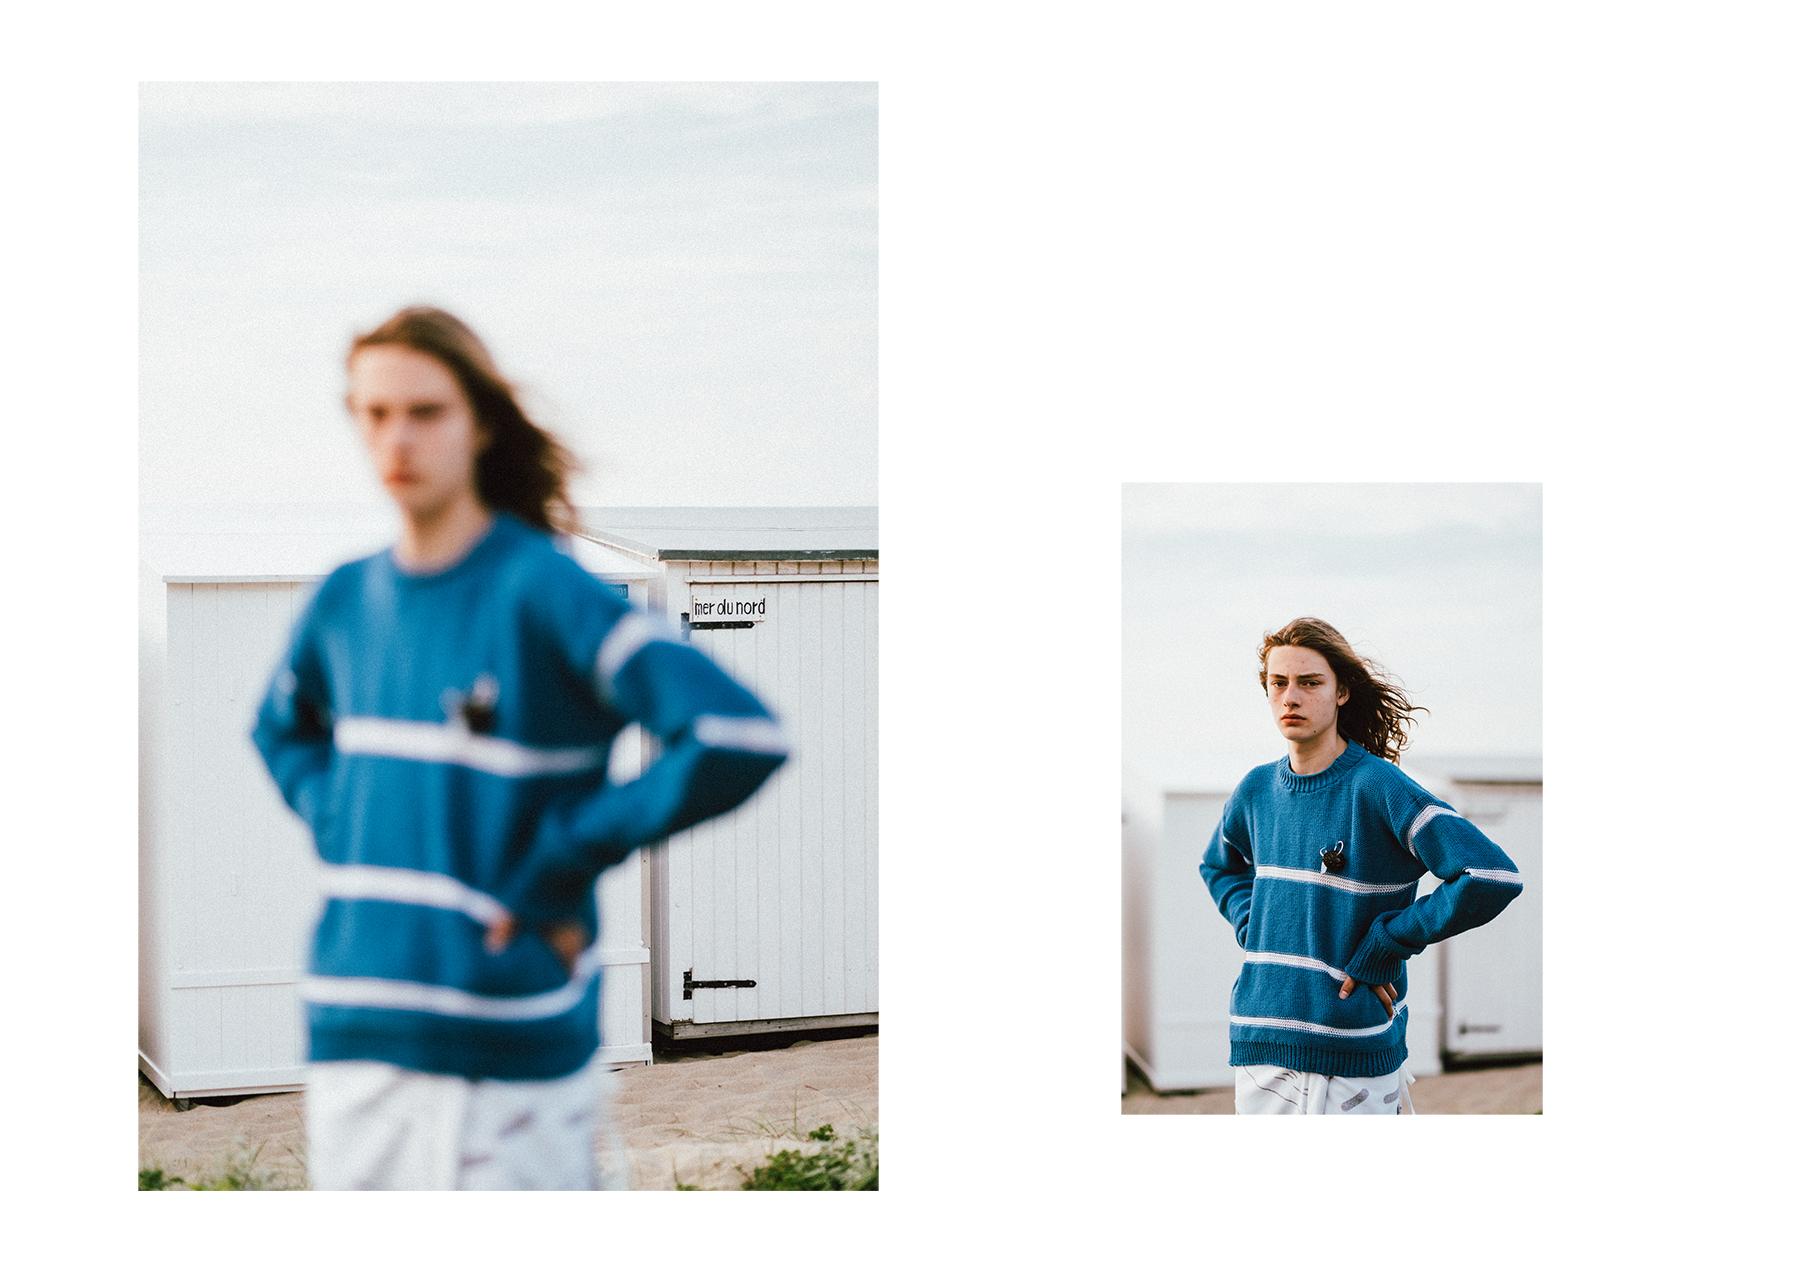 Elliot_Wouter-Struyf_Merdunord